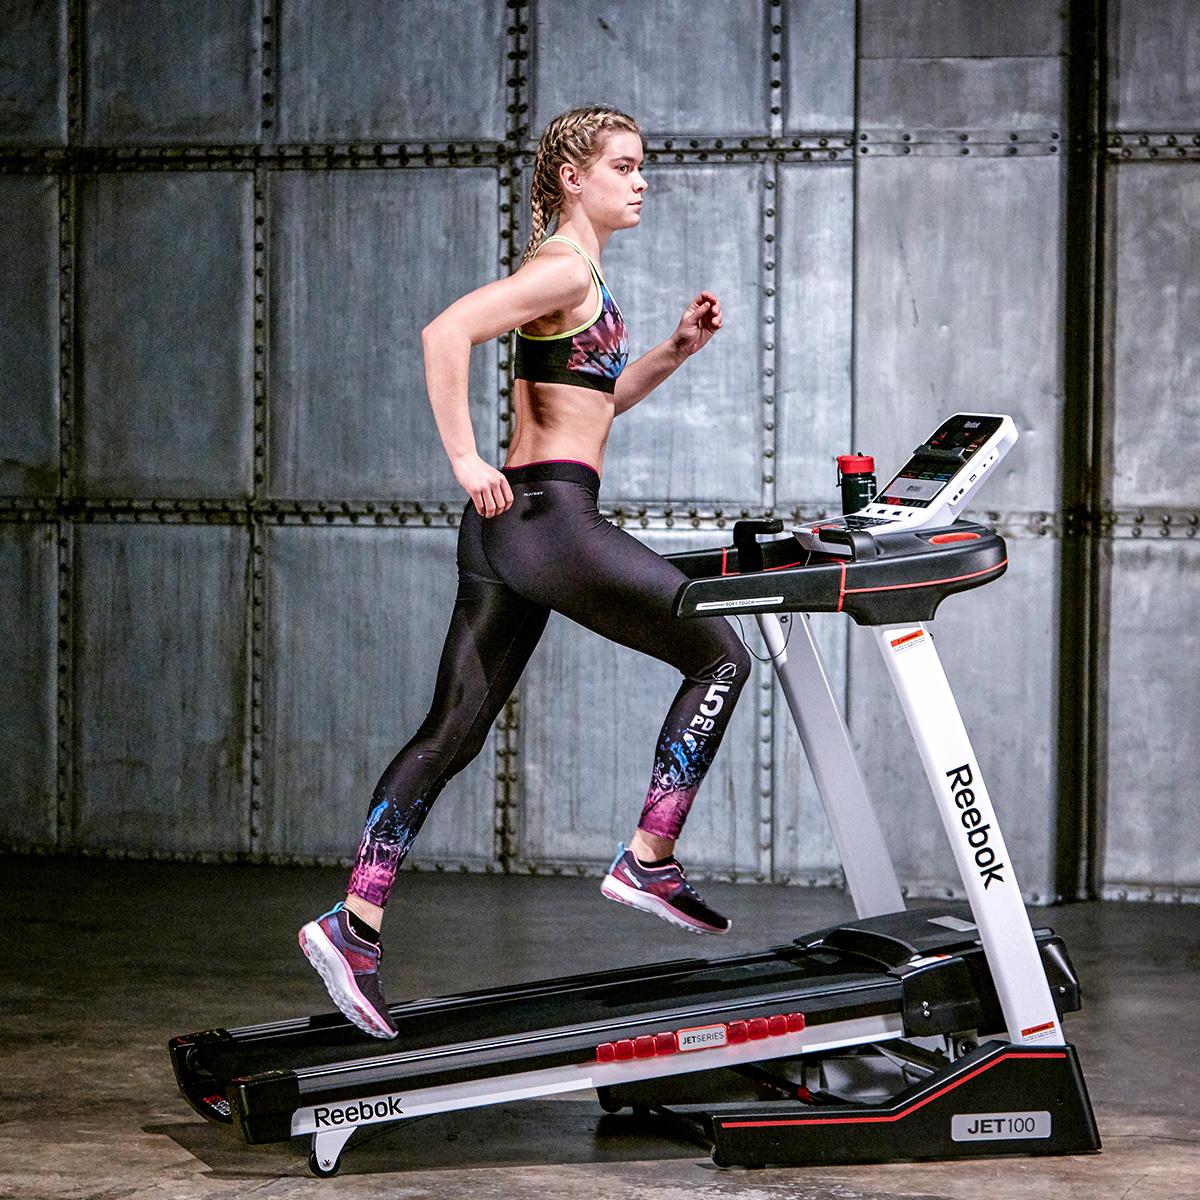 Reebok Jet 100 Series Treadmill Home Gym Equipment Machine